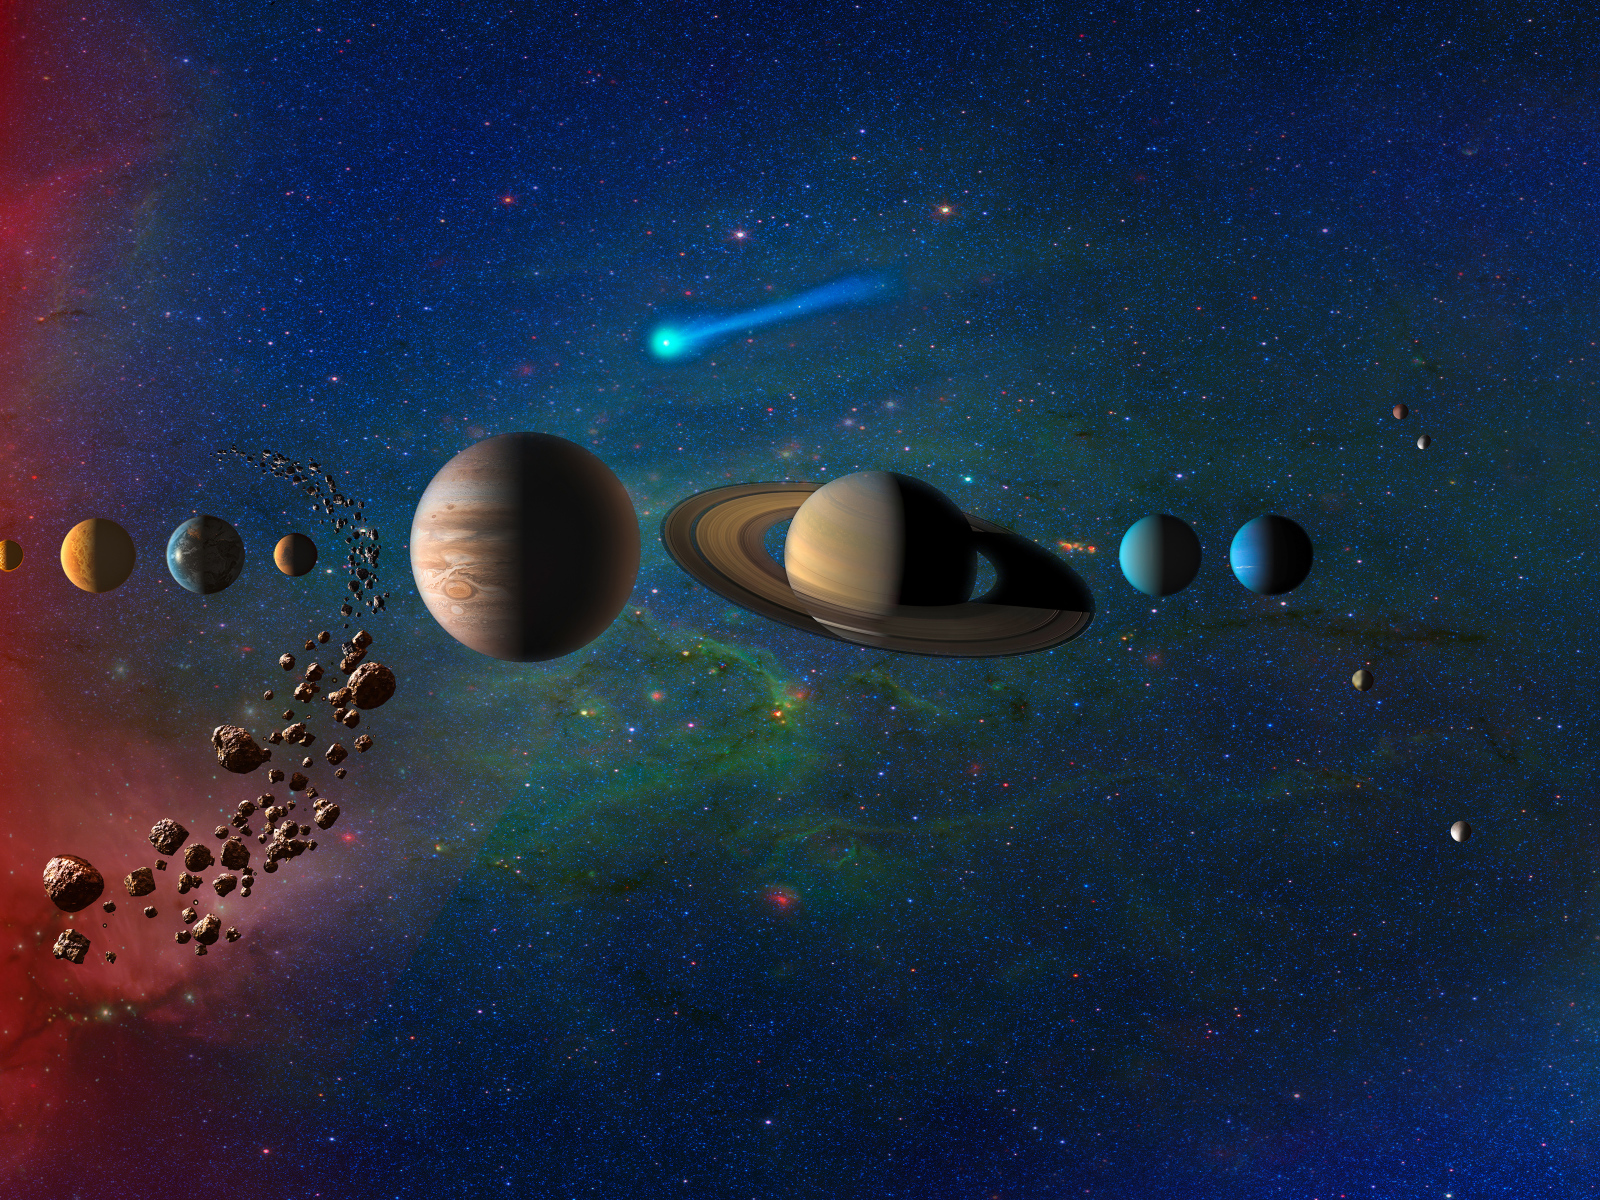 Download Galaxy Note 5 Galaxy S6 Edge Full Hd Stock: Planets In Solar System Galaxy, HD 4K Wallpaper